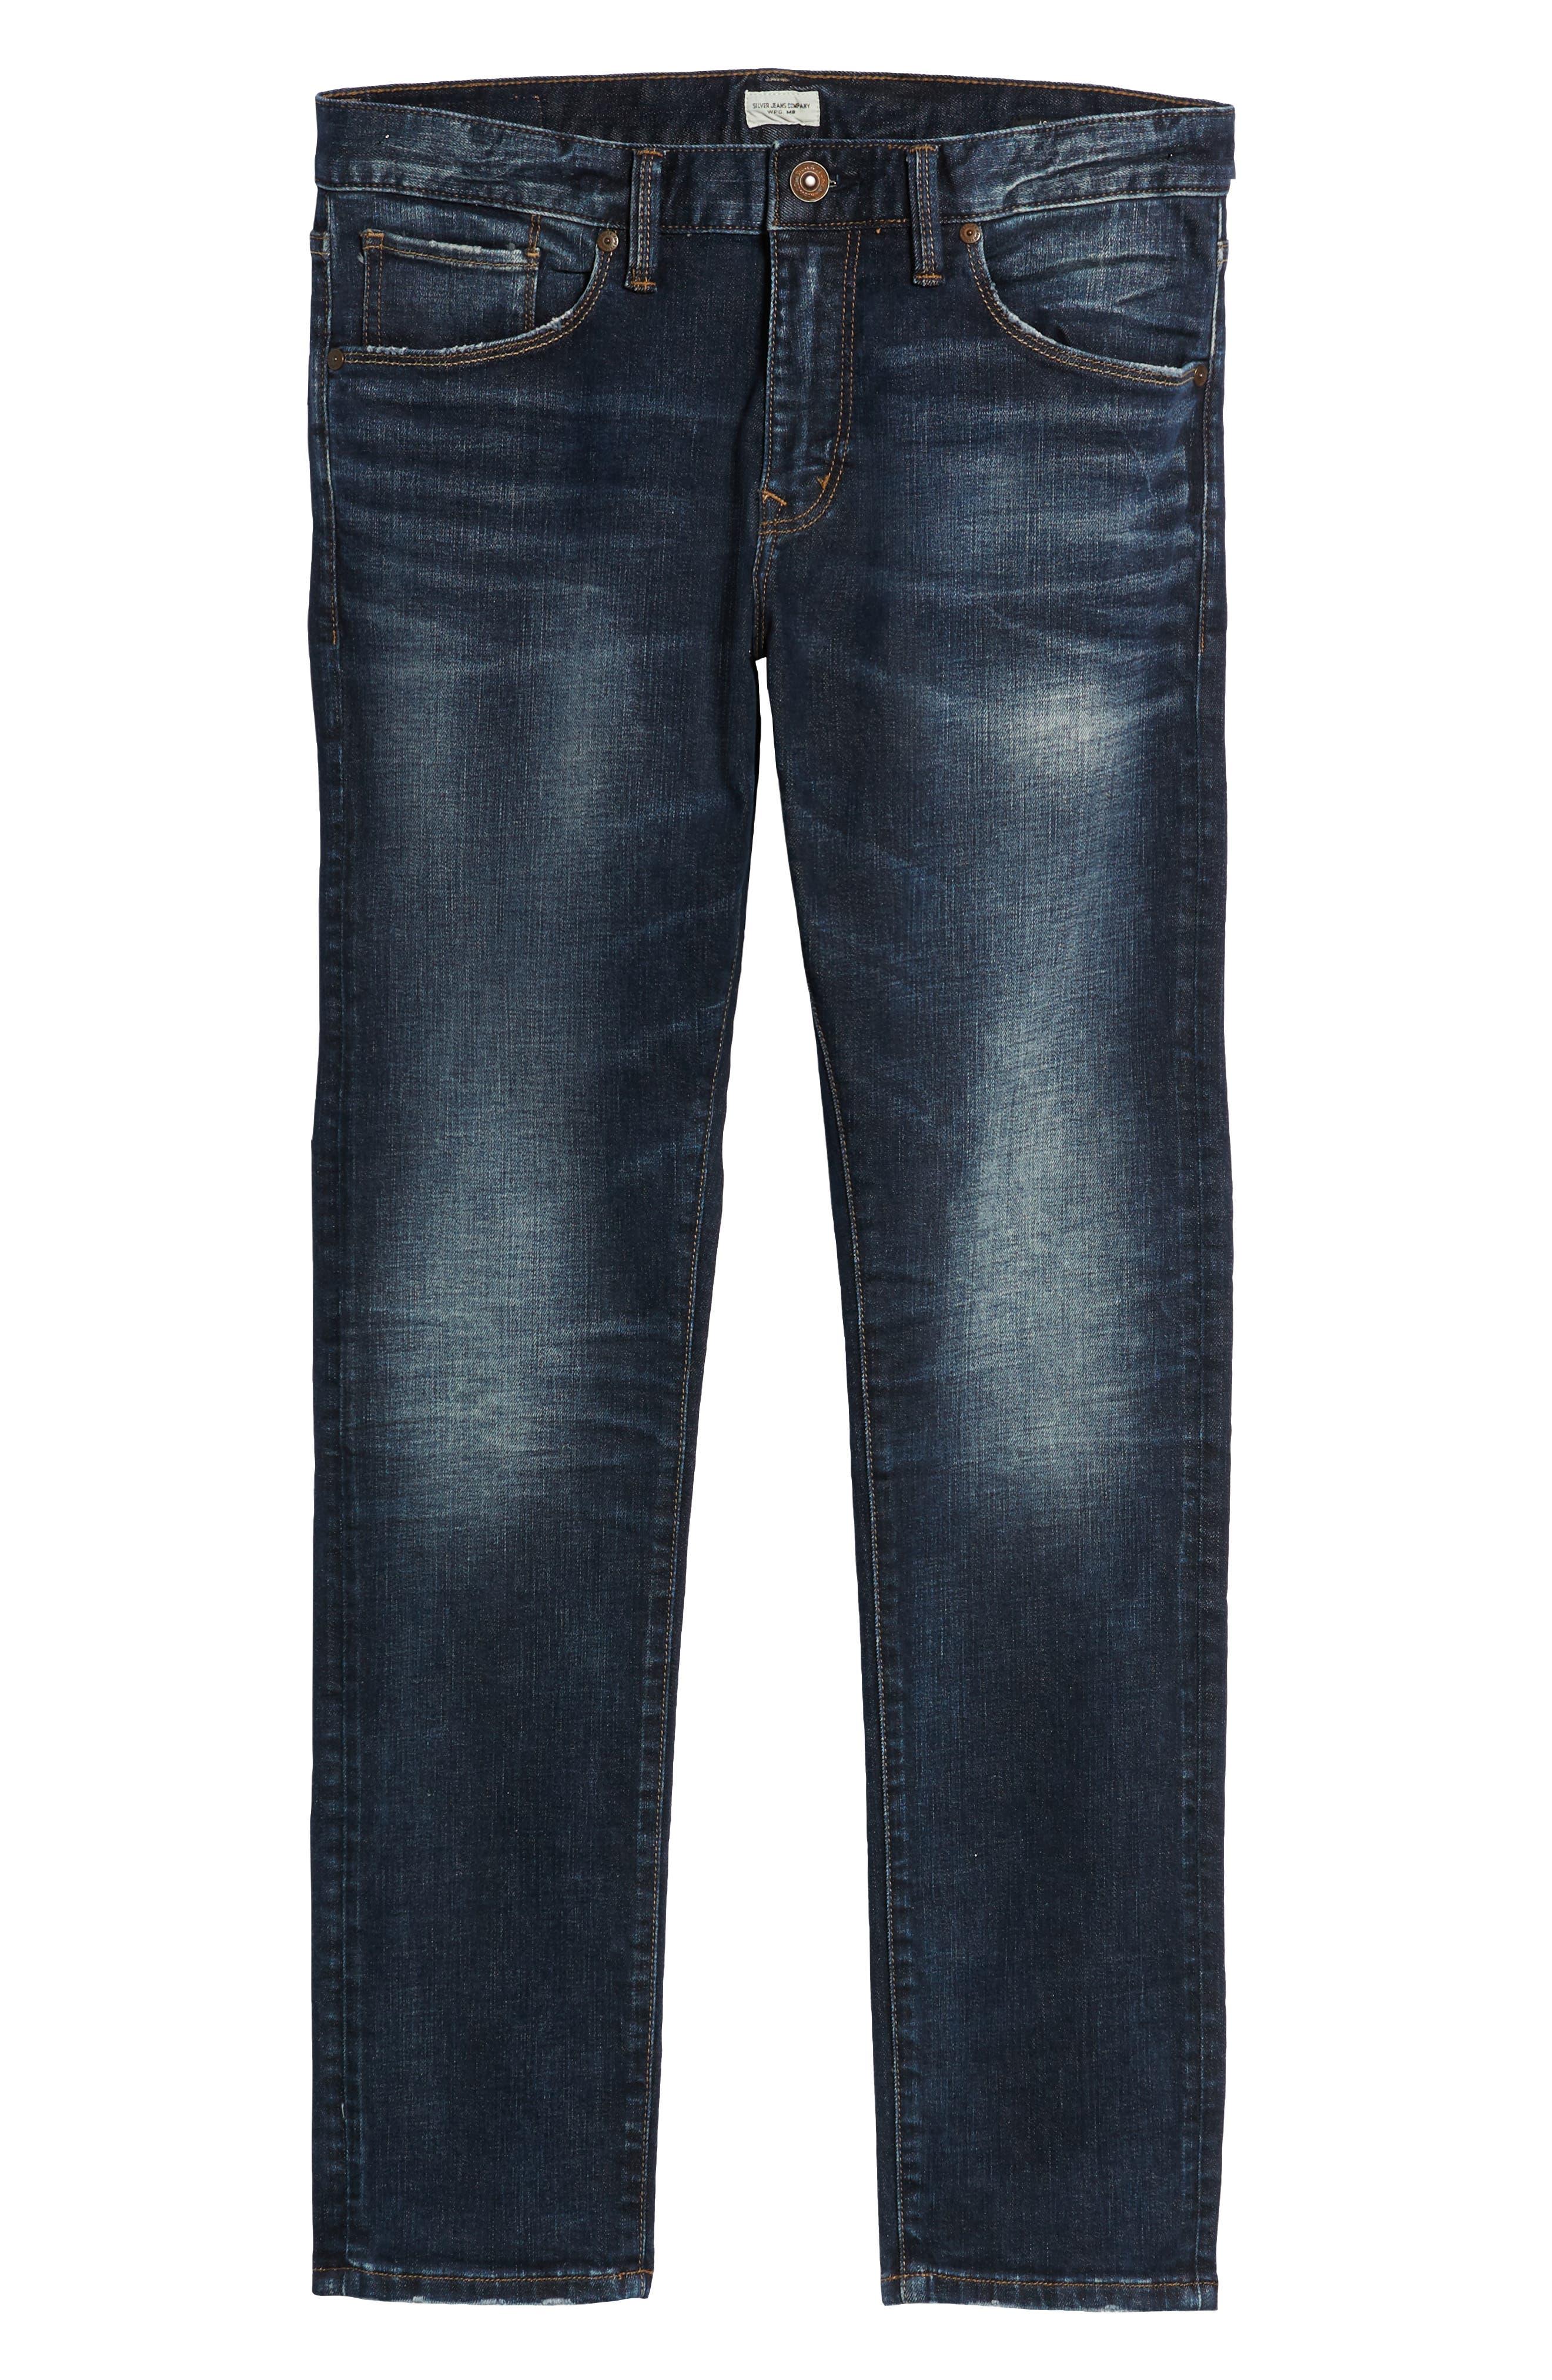 SILVER JEANS CO.,                             Ashdown Slim Straight Fit Jeans,                             Alternate thumbnail 7, color,                             INDIGO